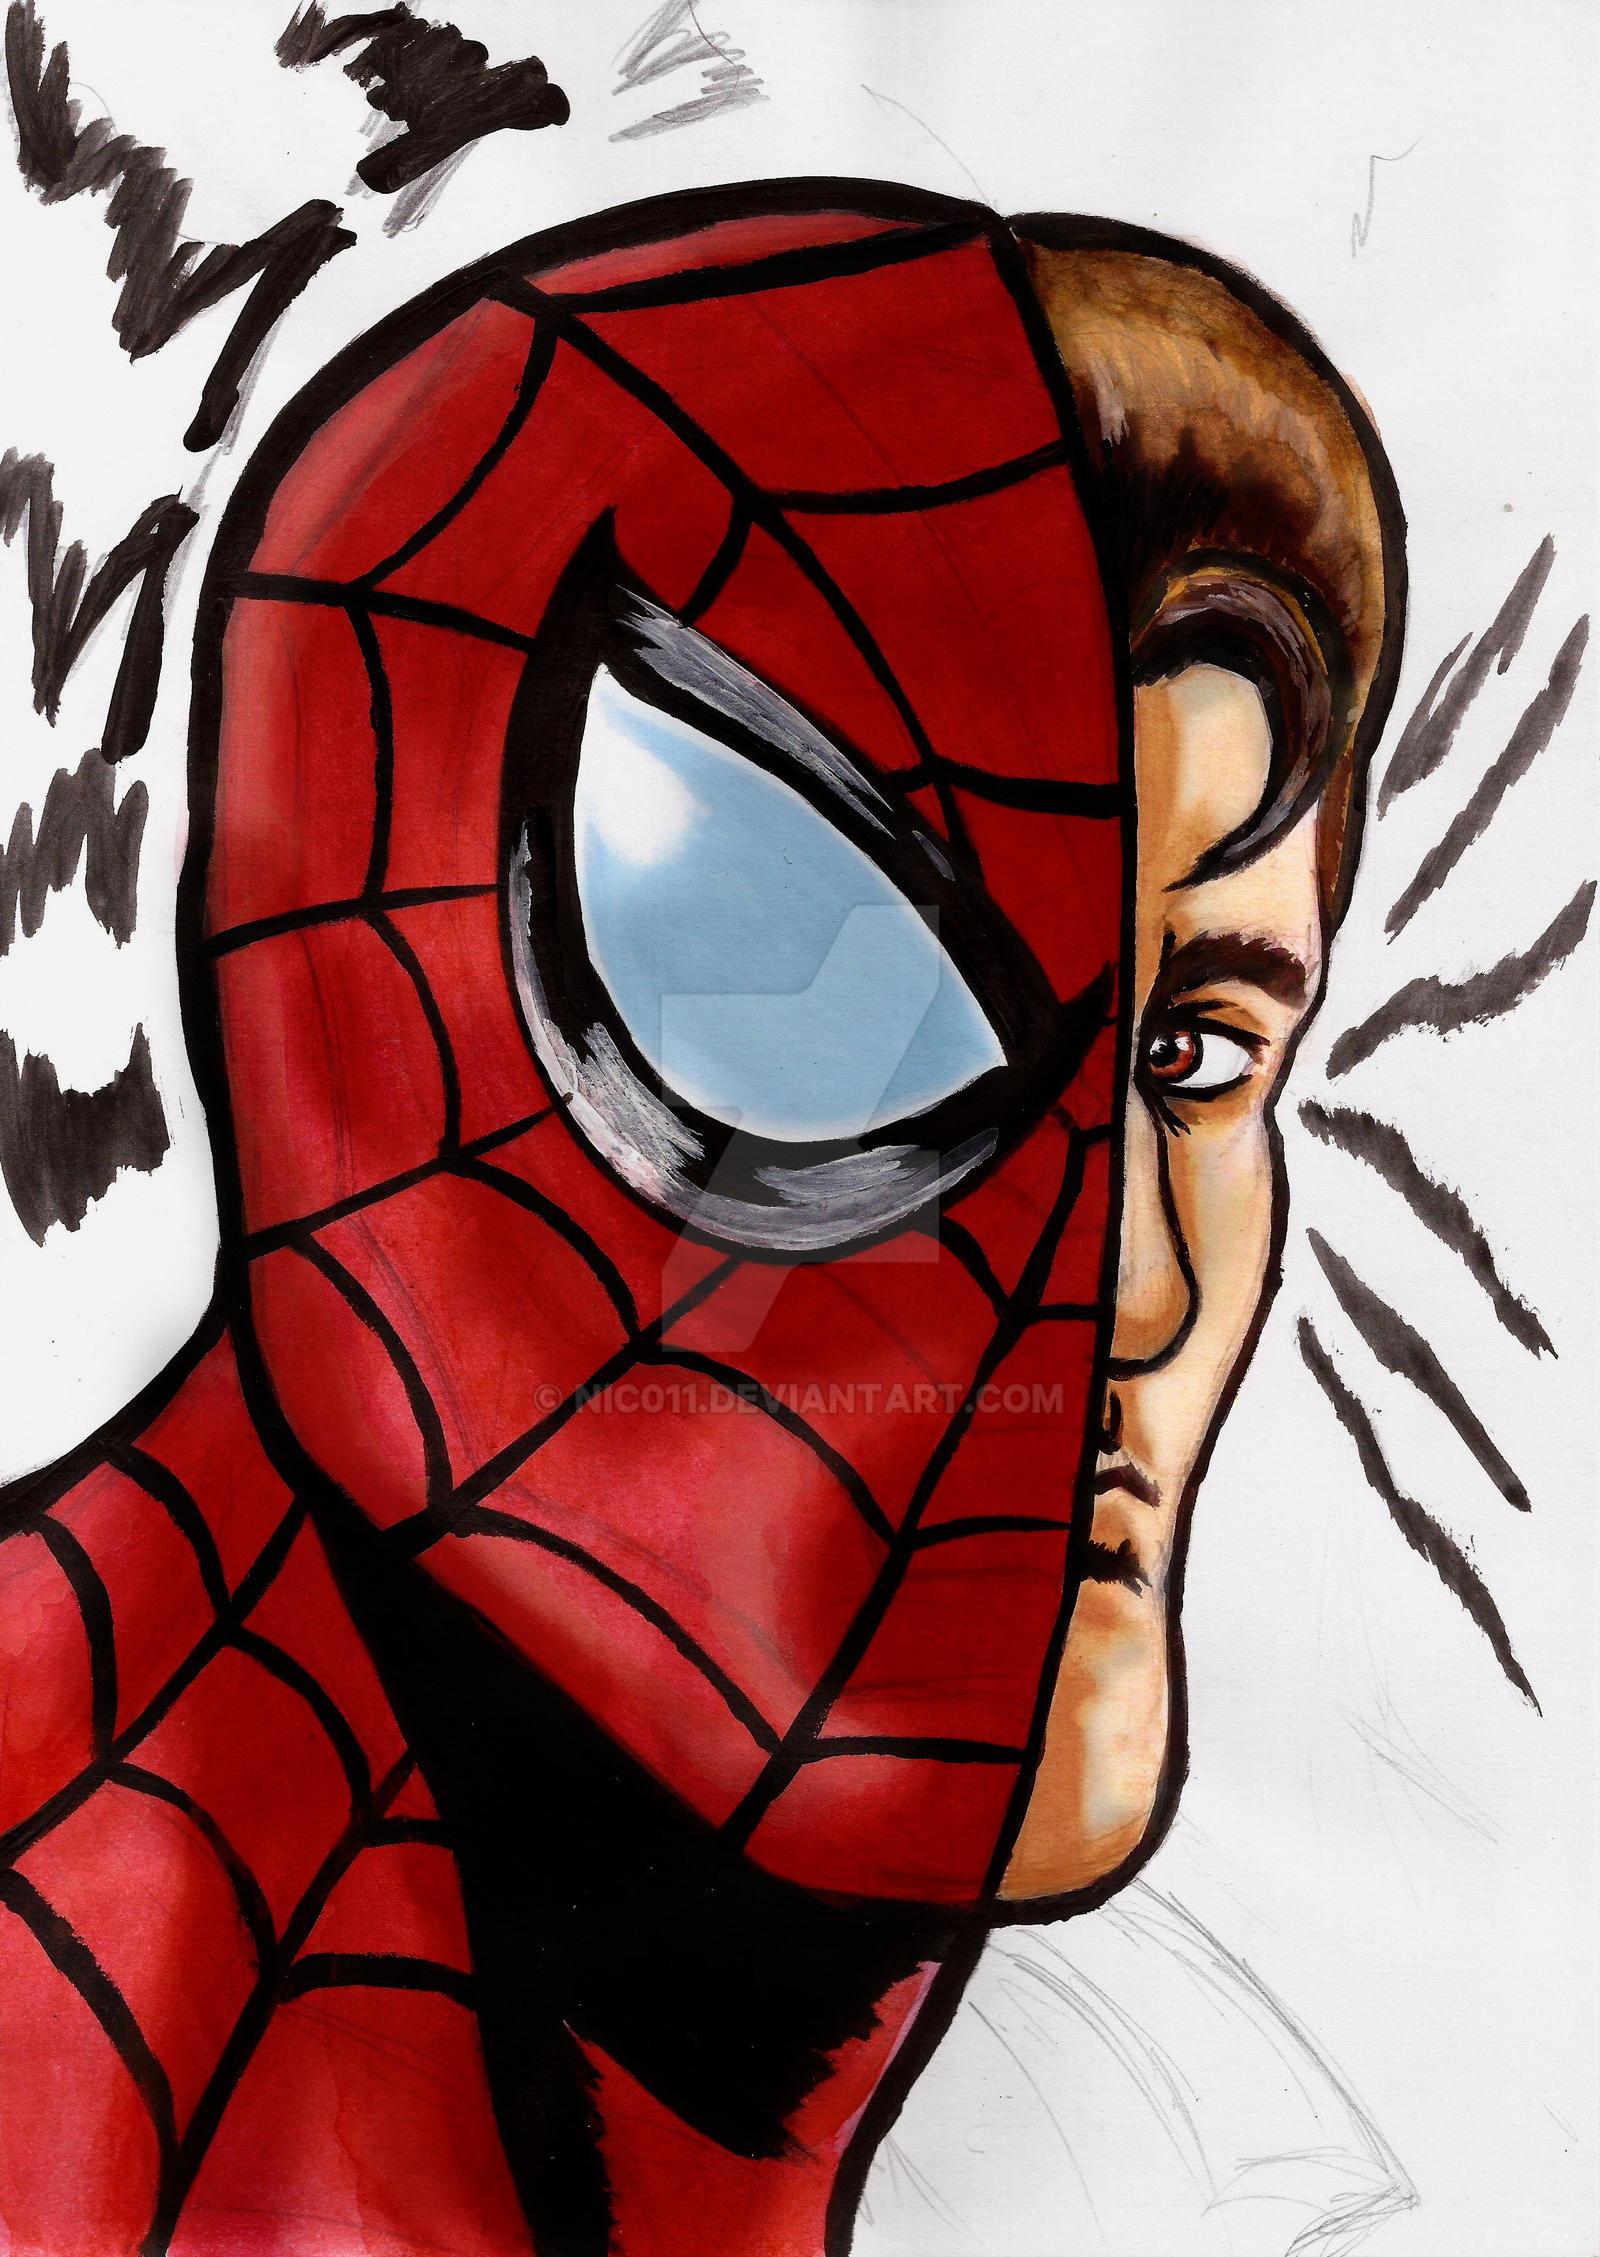 Spider-man! by nic011